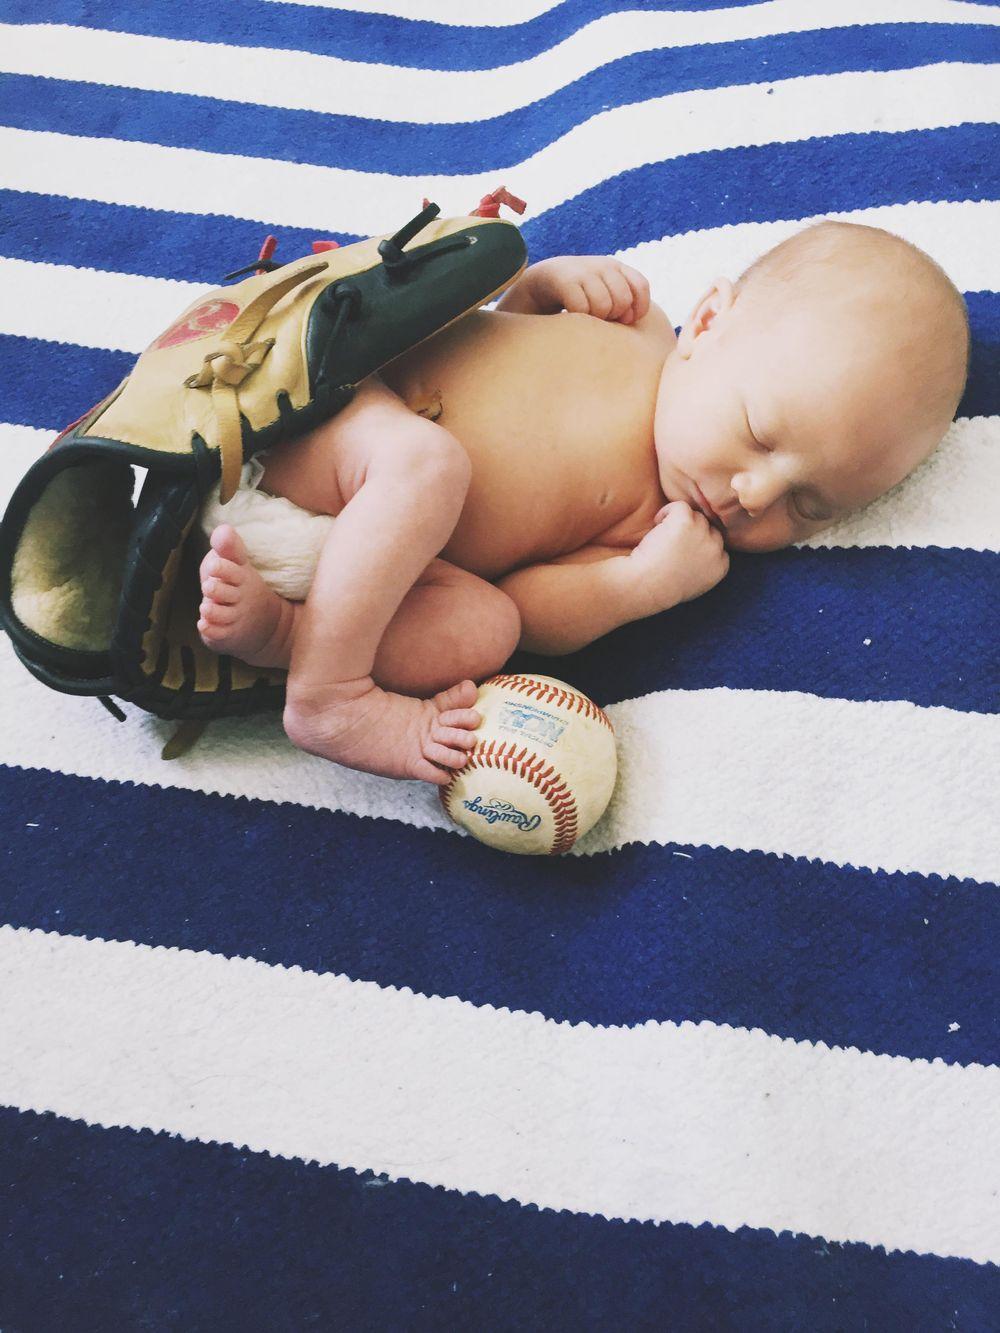 My Nephew's Newborn Photos - image 3 - student project